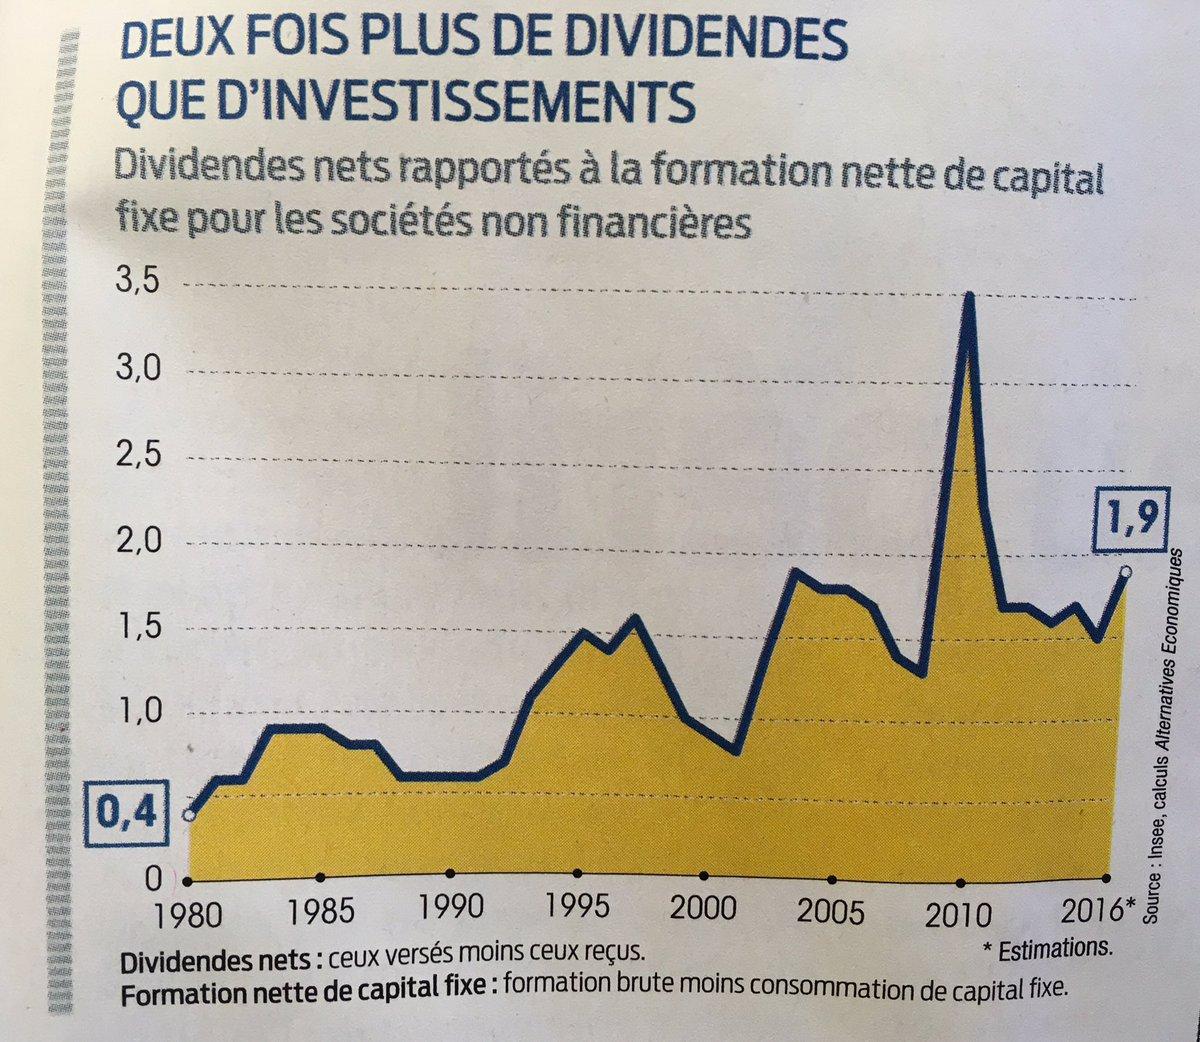 dividendes versus investissement : deux fois plus